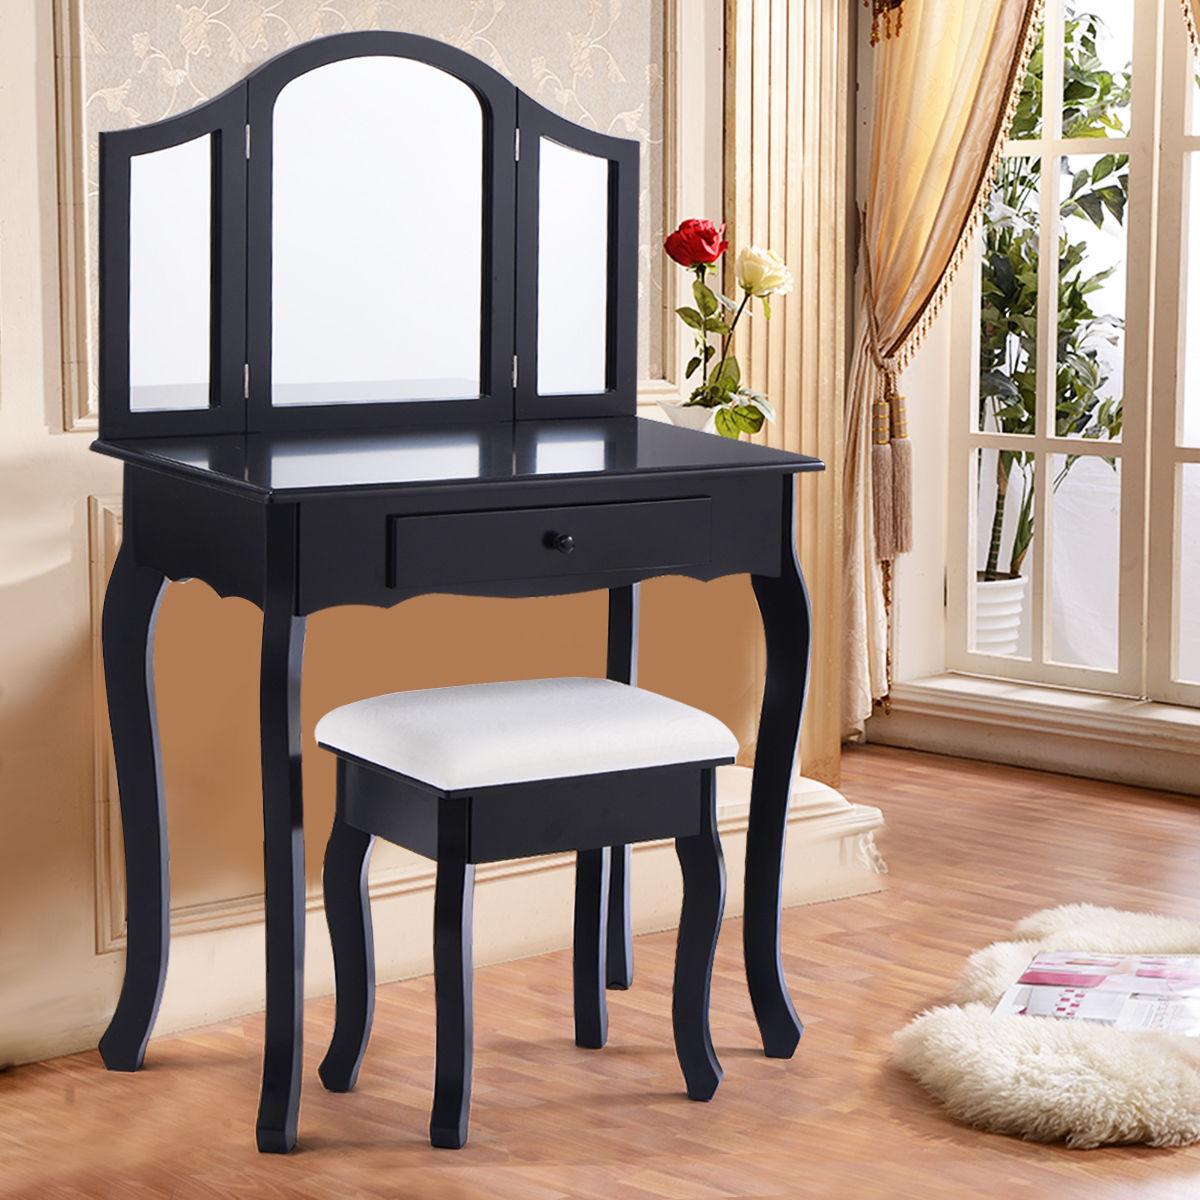 Costway Wooden Vanity Makeup Dressing Table Stool Set Bedroom White